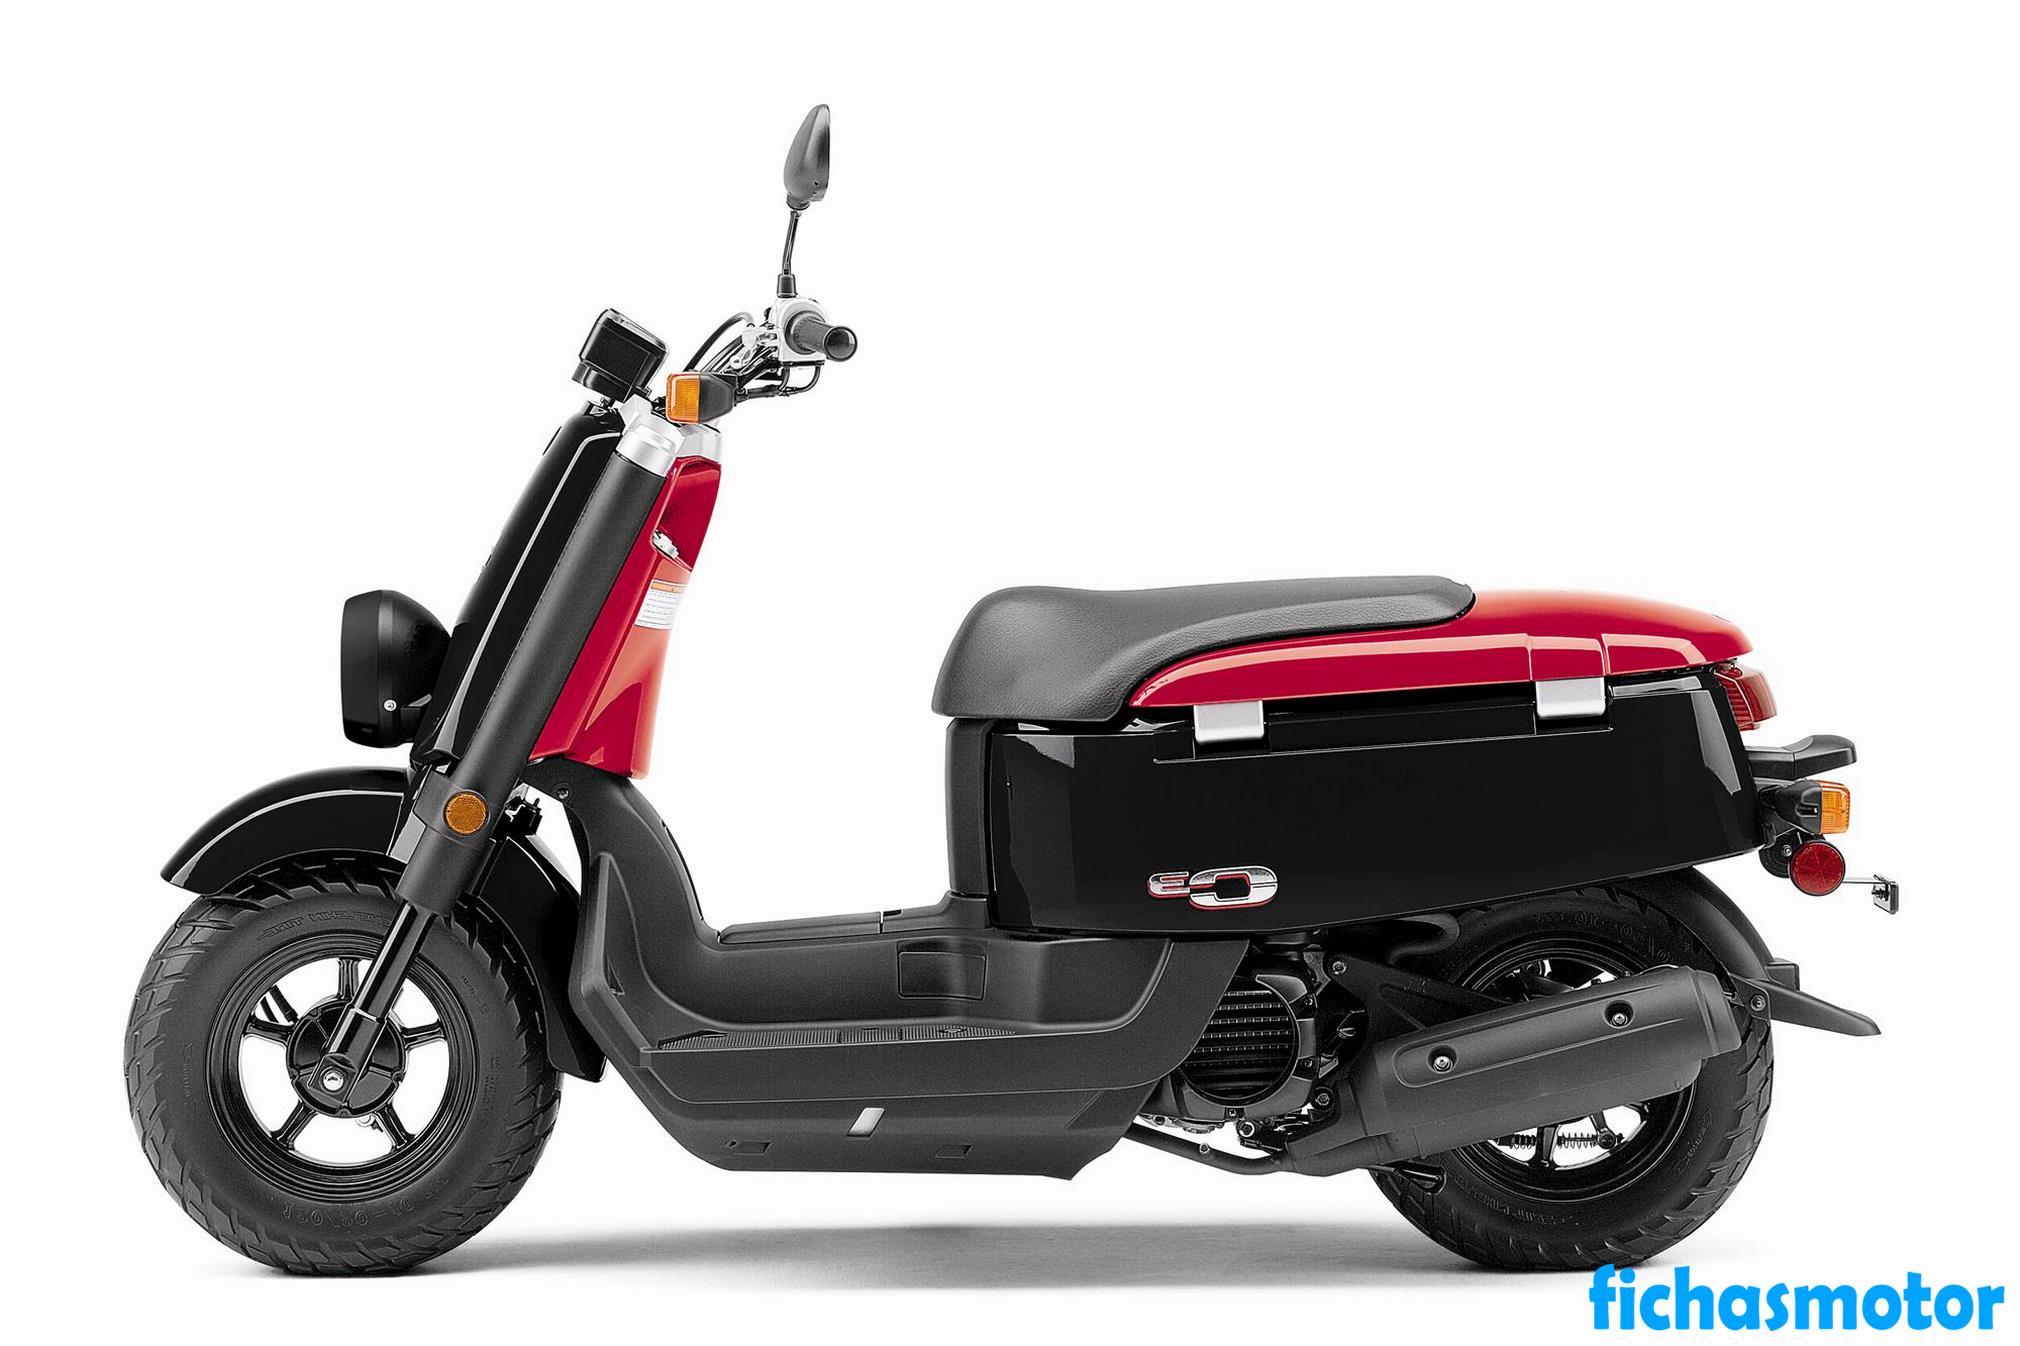 Ficha técnica Yamaha c3 2011